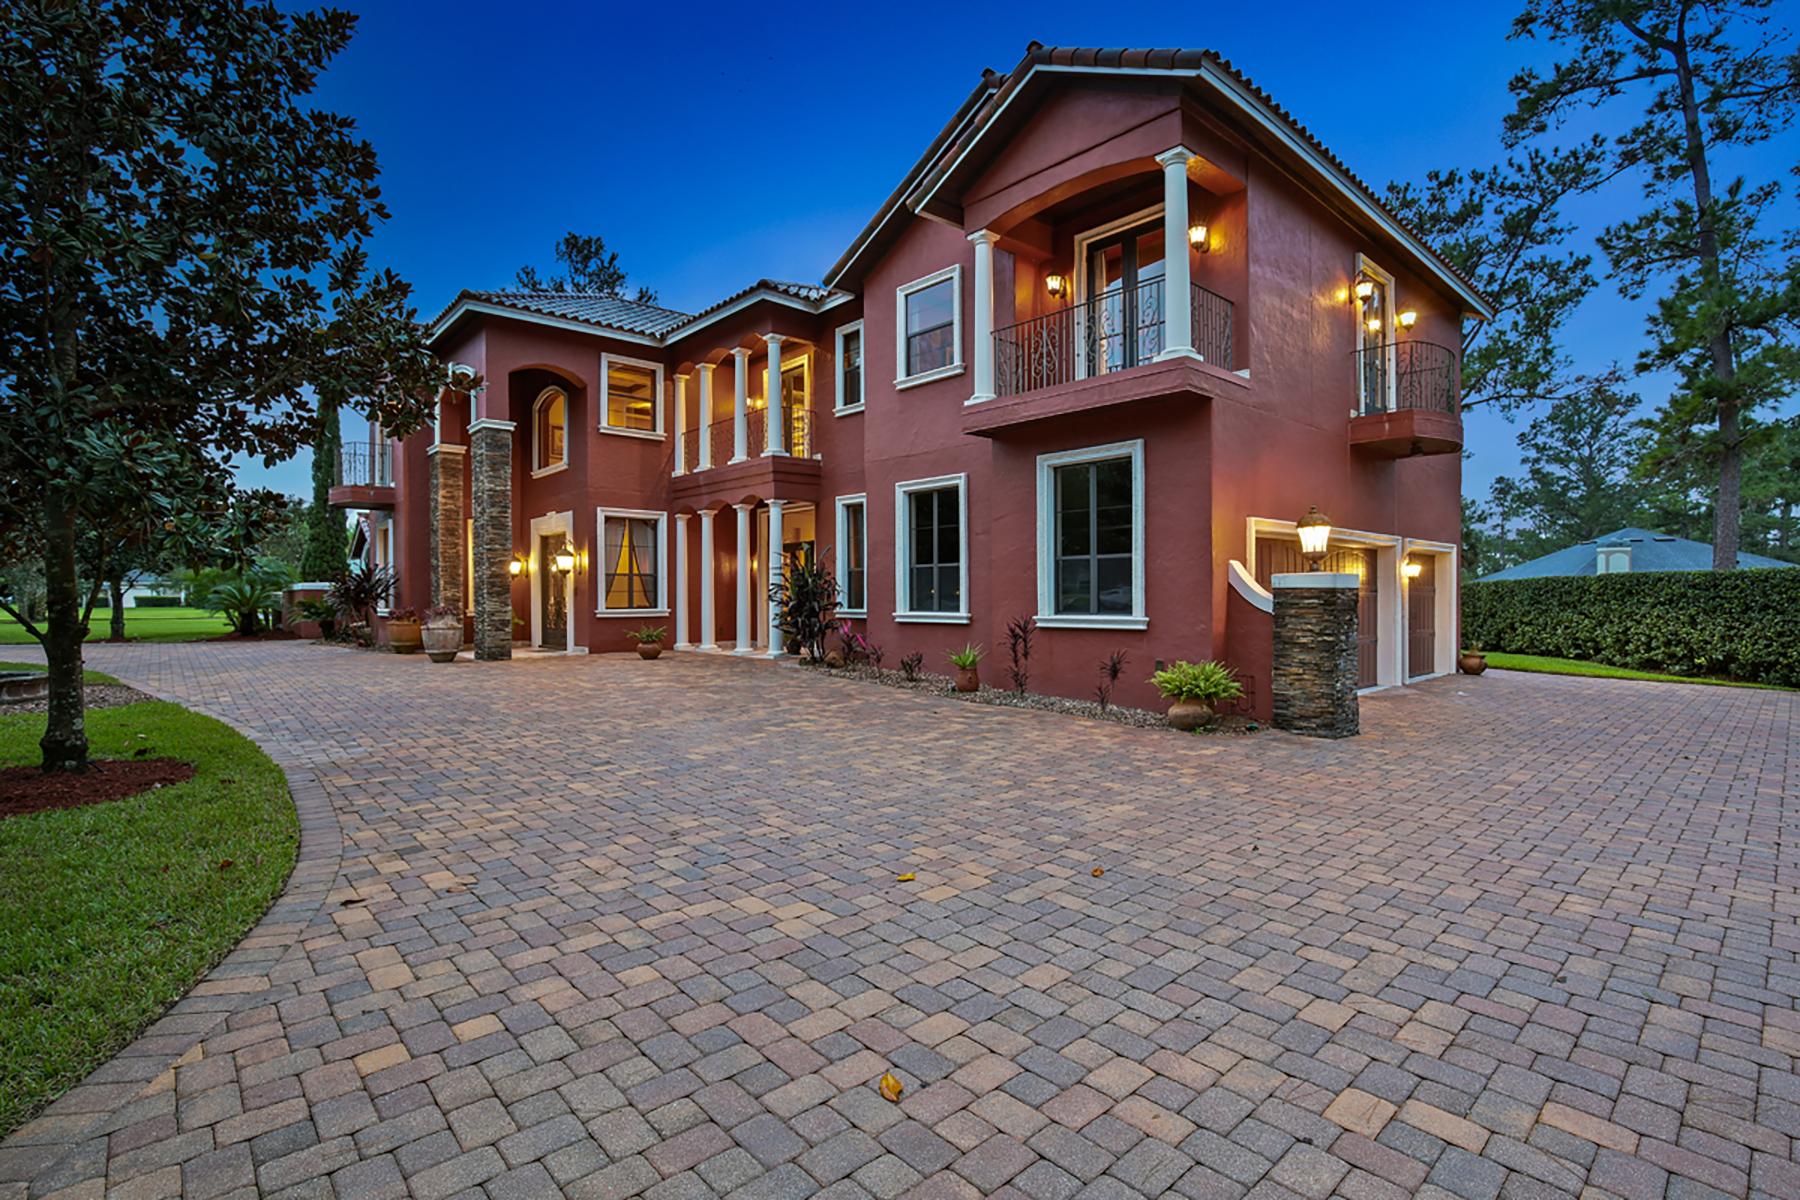 Single Family Homes for Sale at SANFORD 8403 Rambling River Dr Sanford, Florida 32771 United States